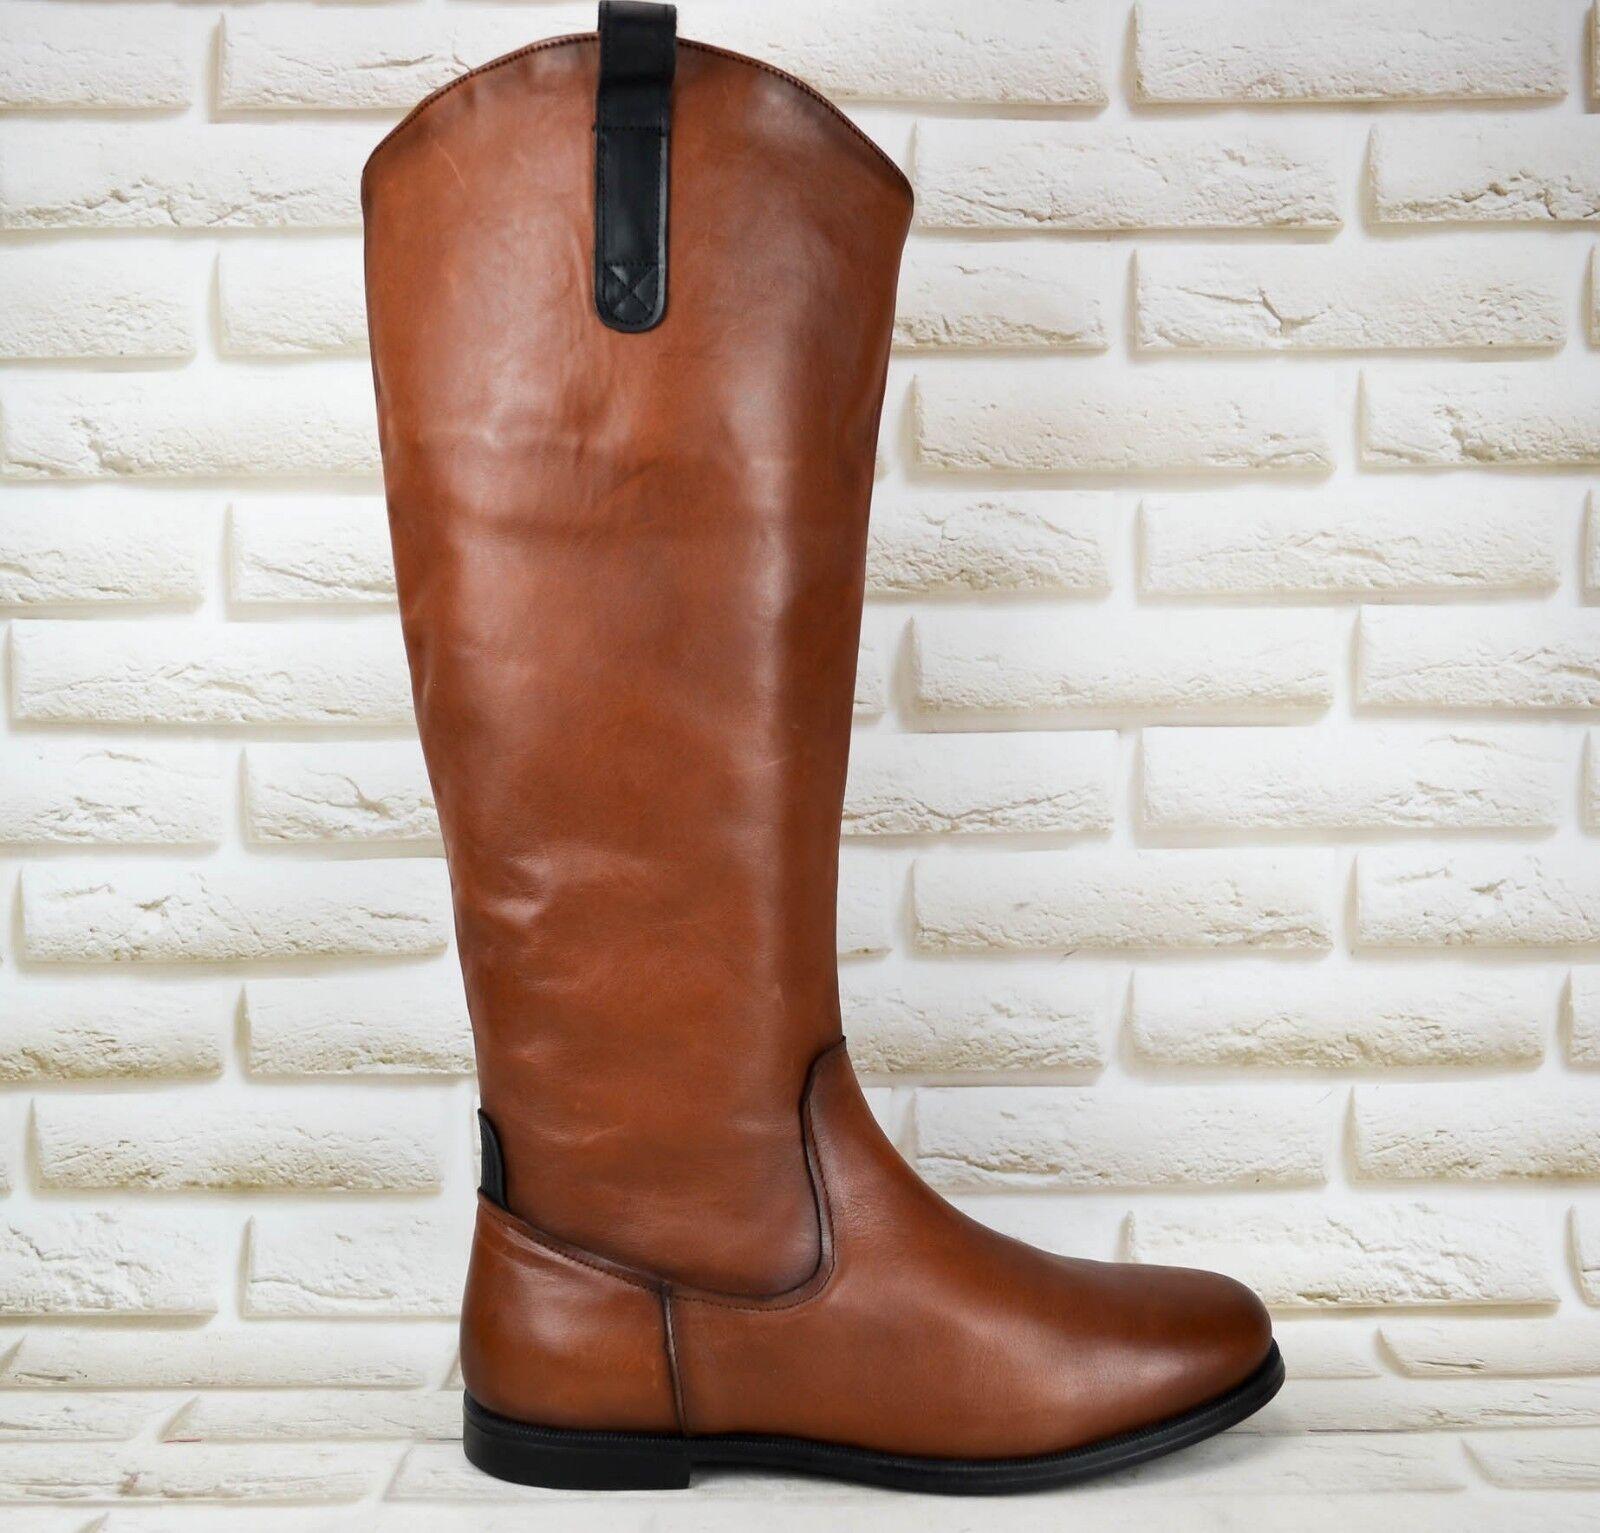 SEBAGO Plaza Brown Leather Womens Knee High Long Boot PORTUGAL Size 7.5 EU